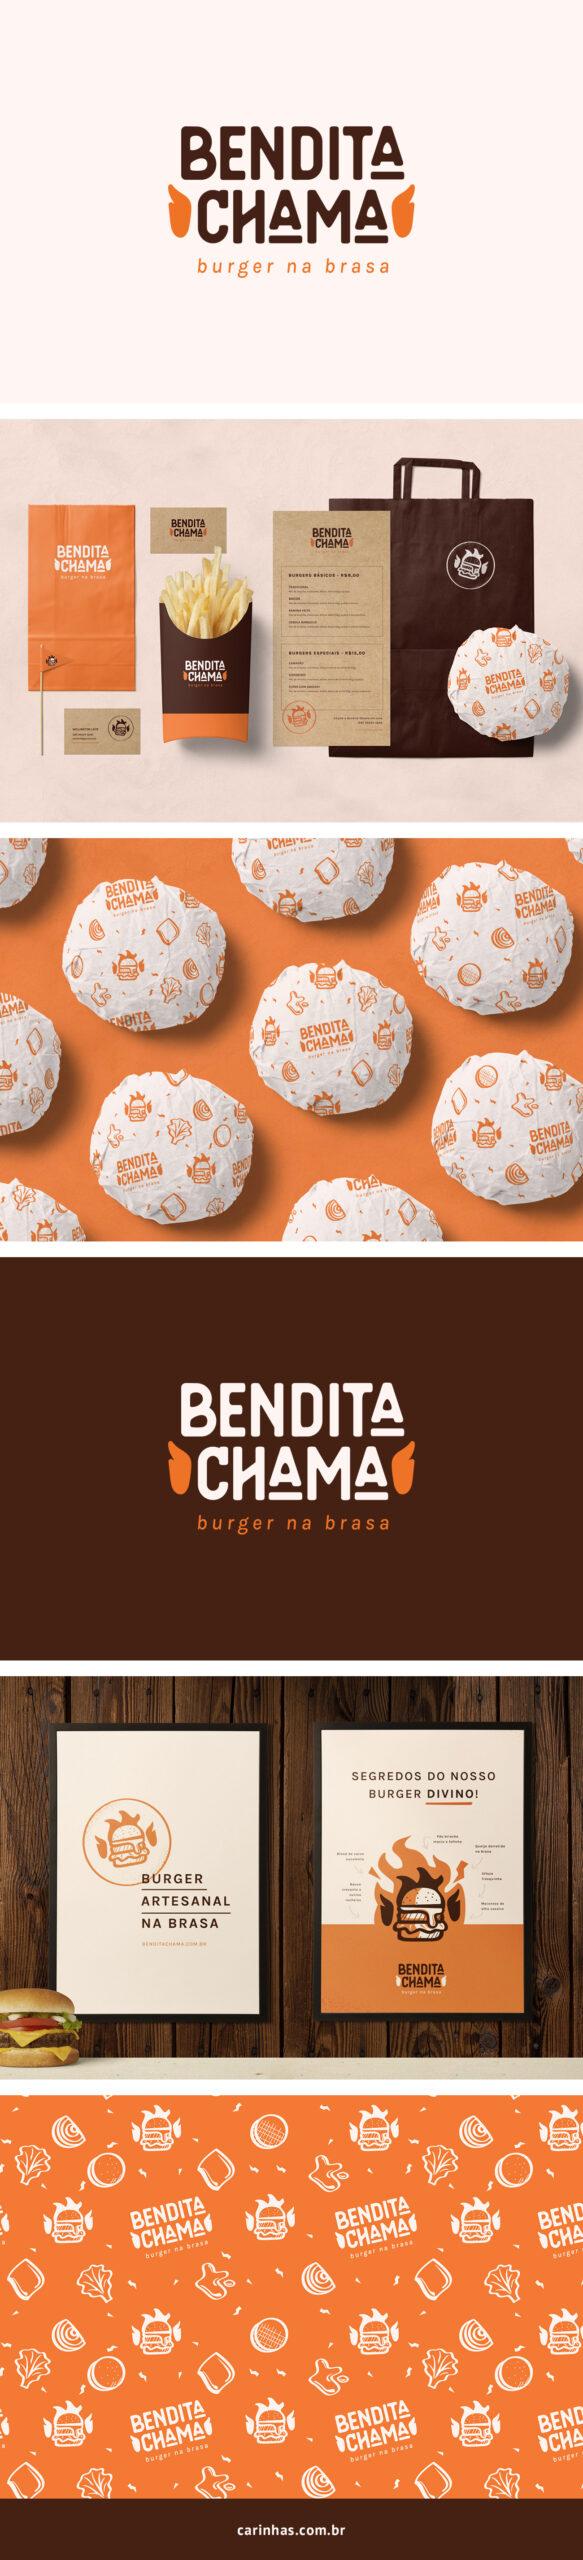 Bendita Chama - Projeto de Marca Apaixonante para hamburgueria